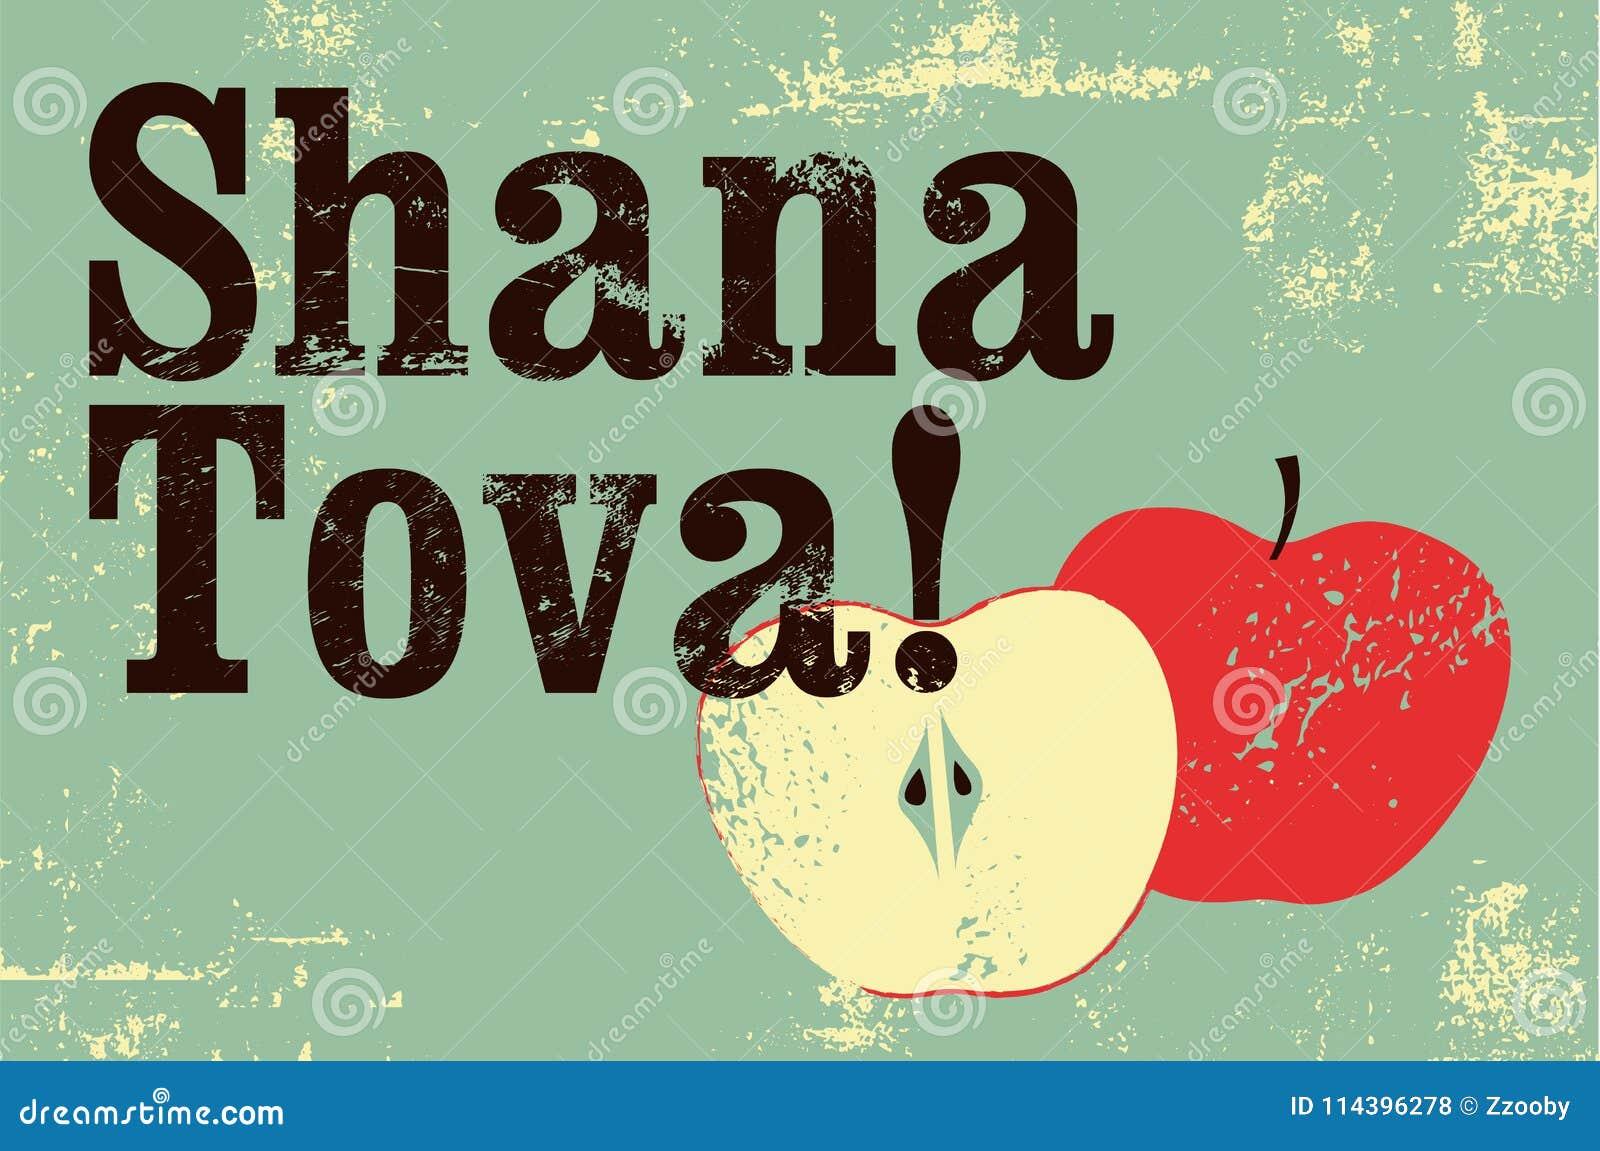 Shana Tova Typographic Vintage Grunge Style Jewish New Year Poster